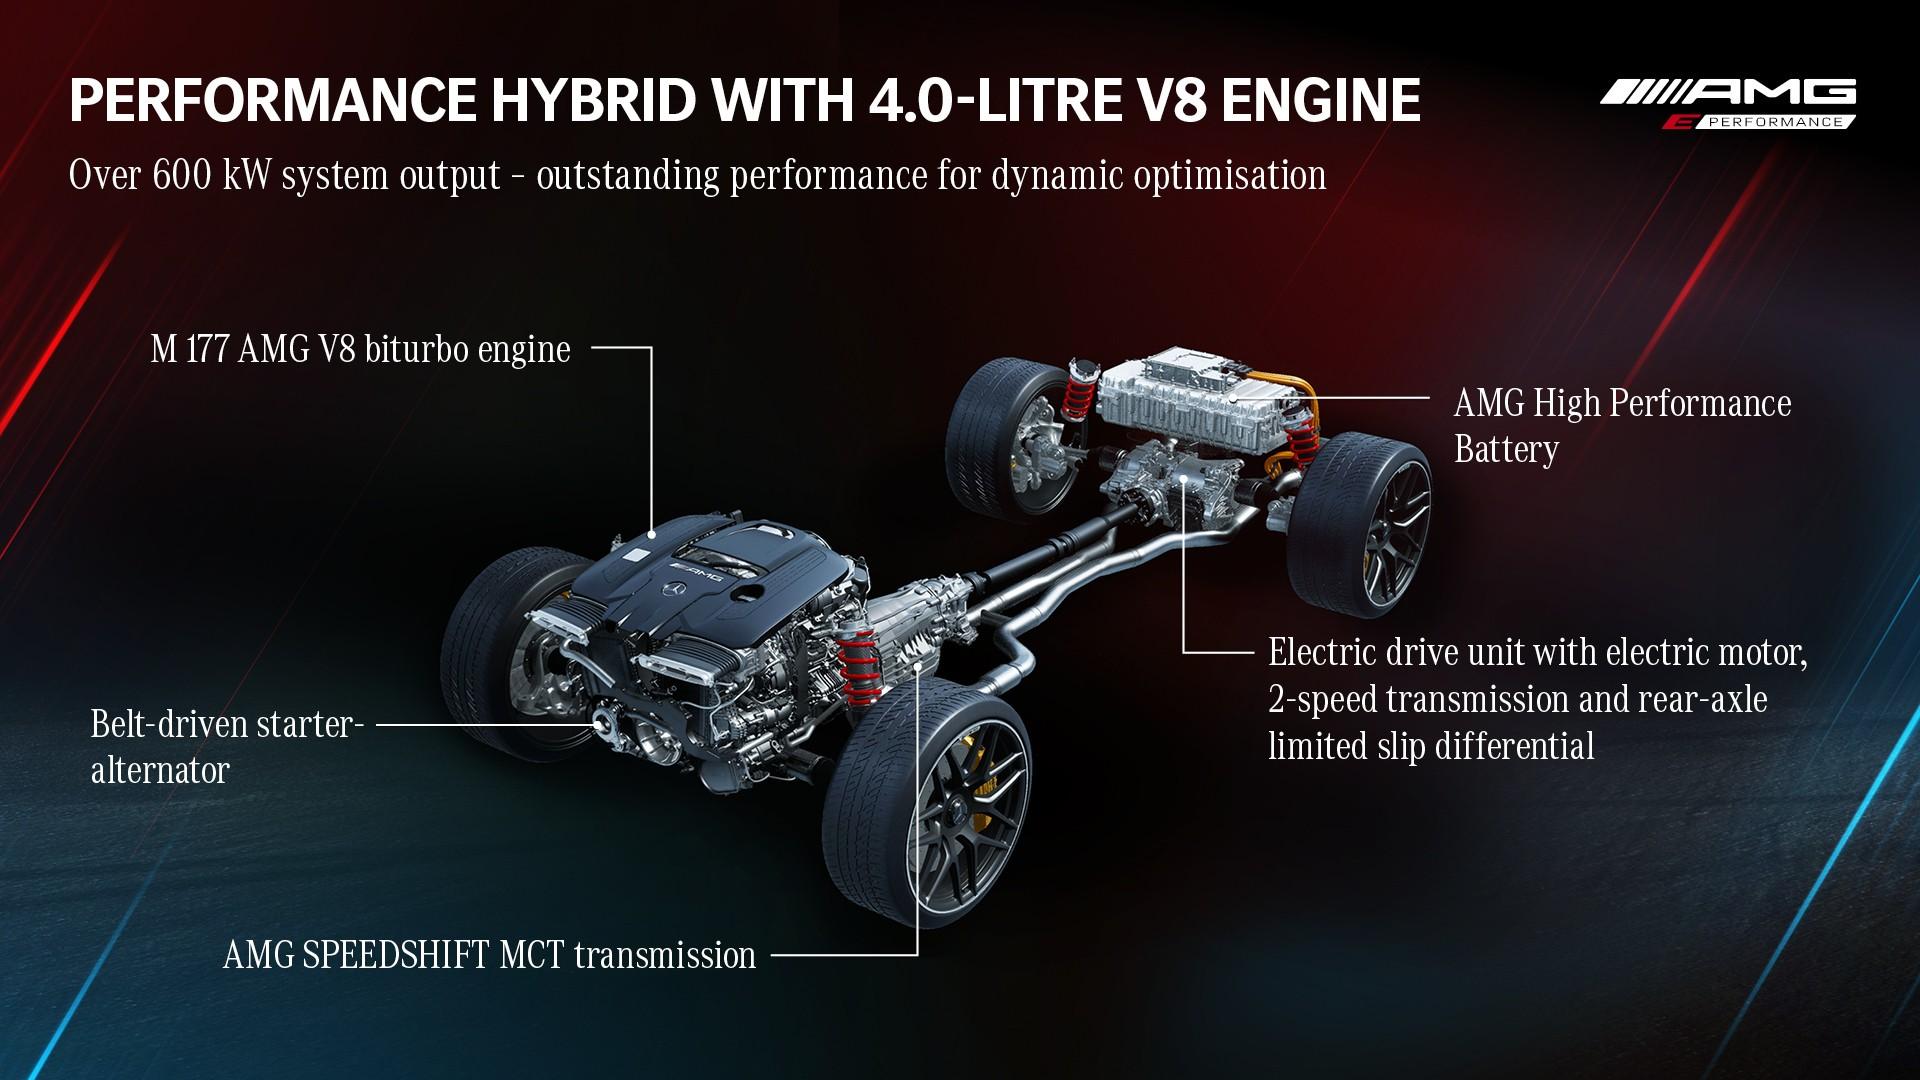 Mercedes AMG-GT 73s